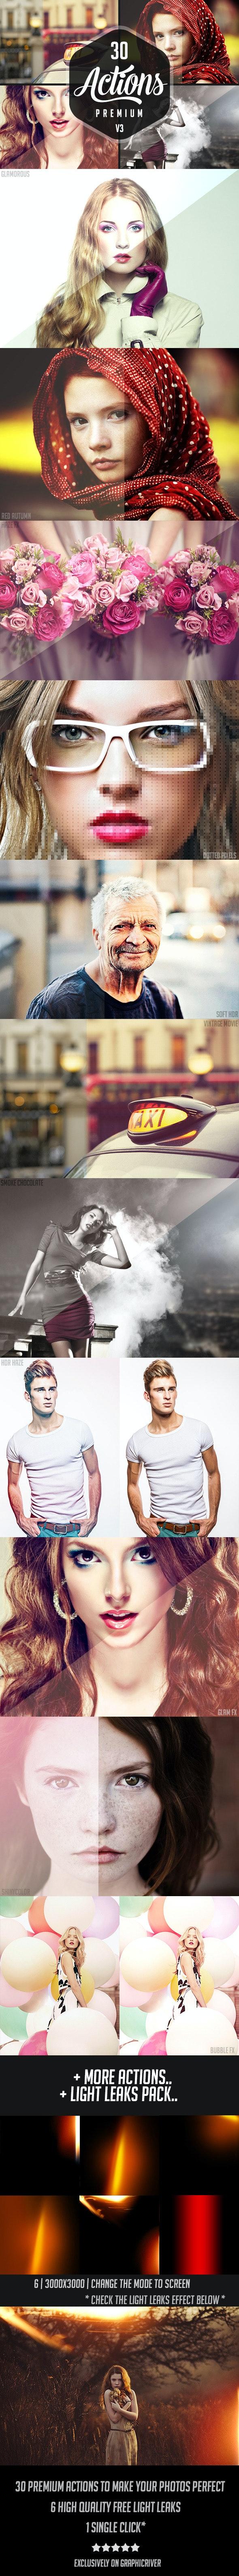 30 Premium Photoshop Actions 3  - Photo Effects Actions